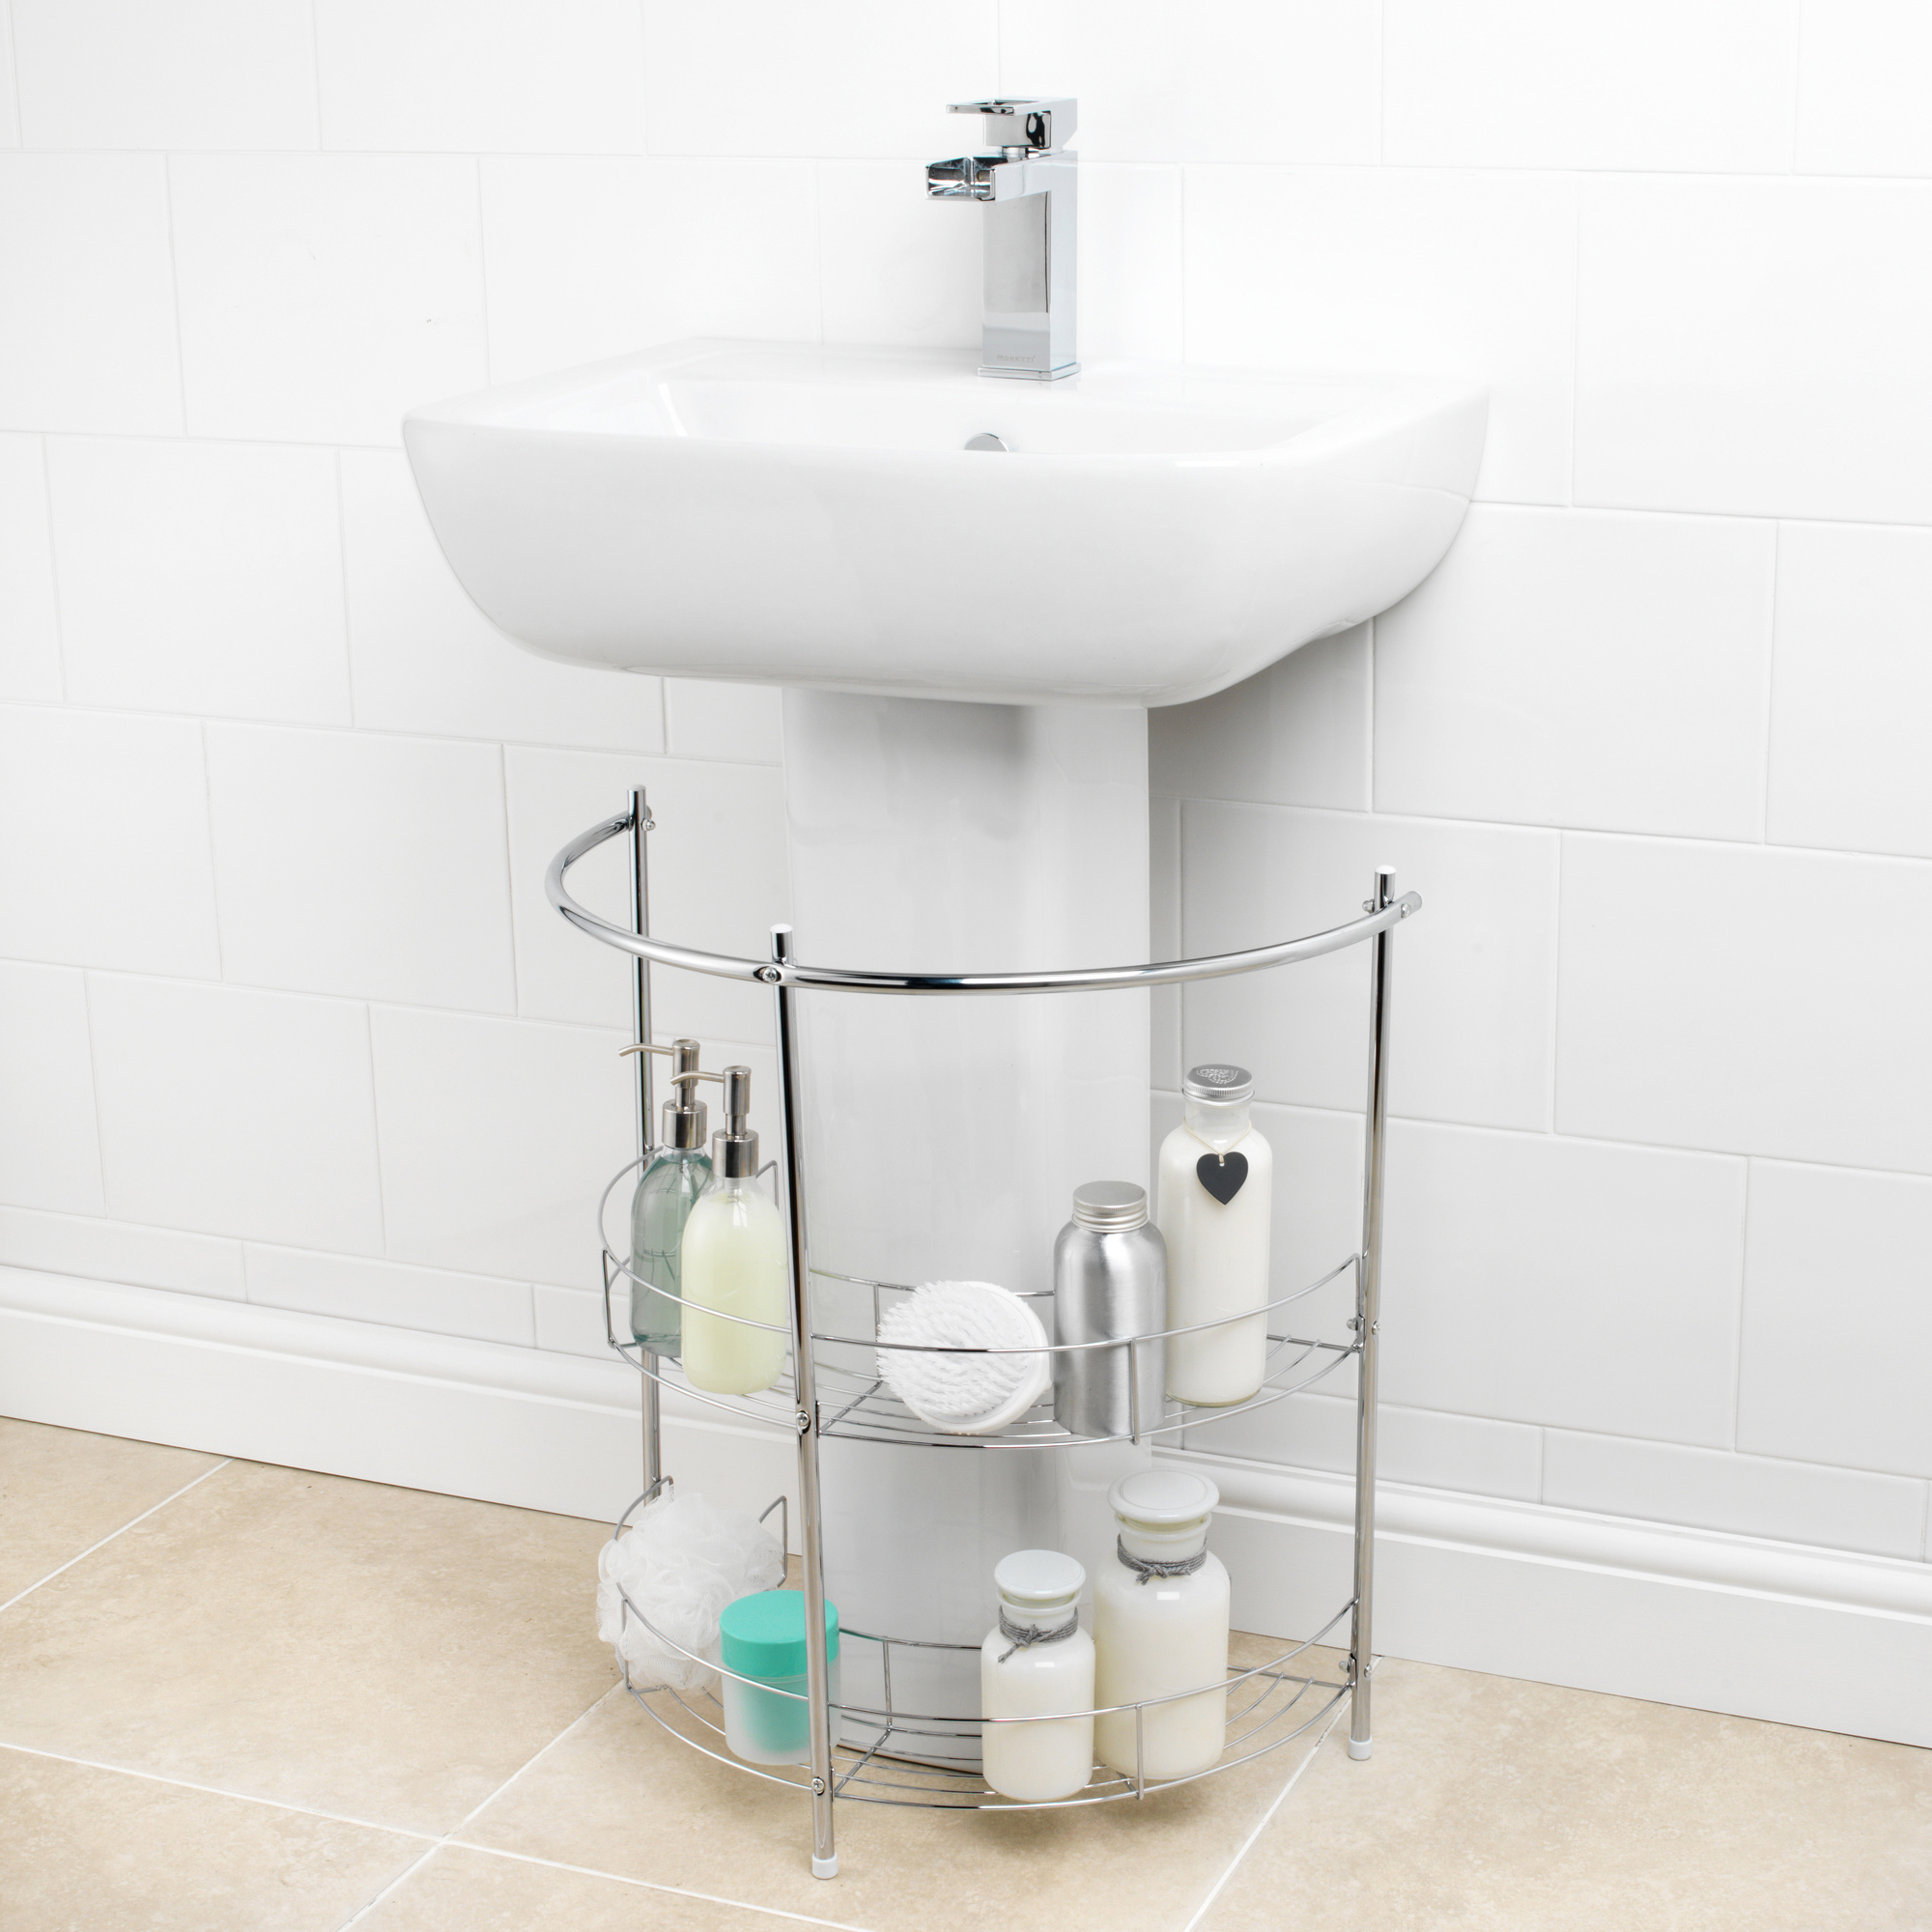 beldray la037152 under sink storage shelf unit